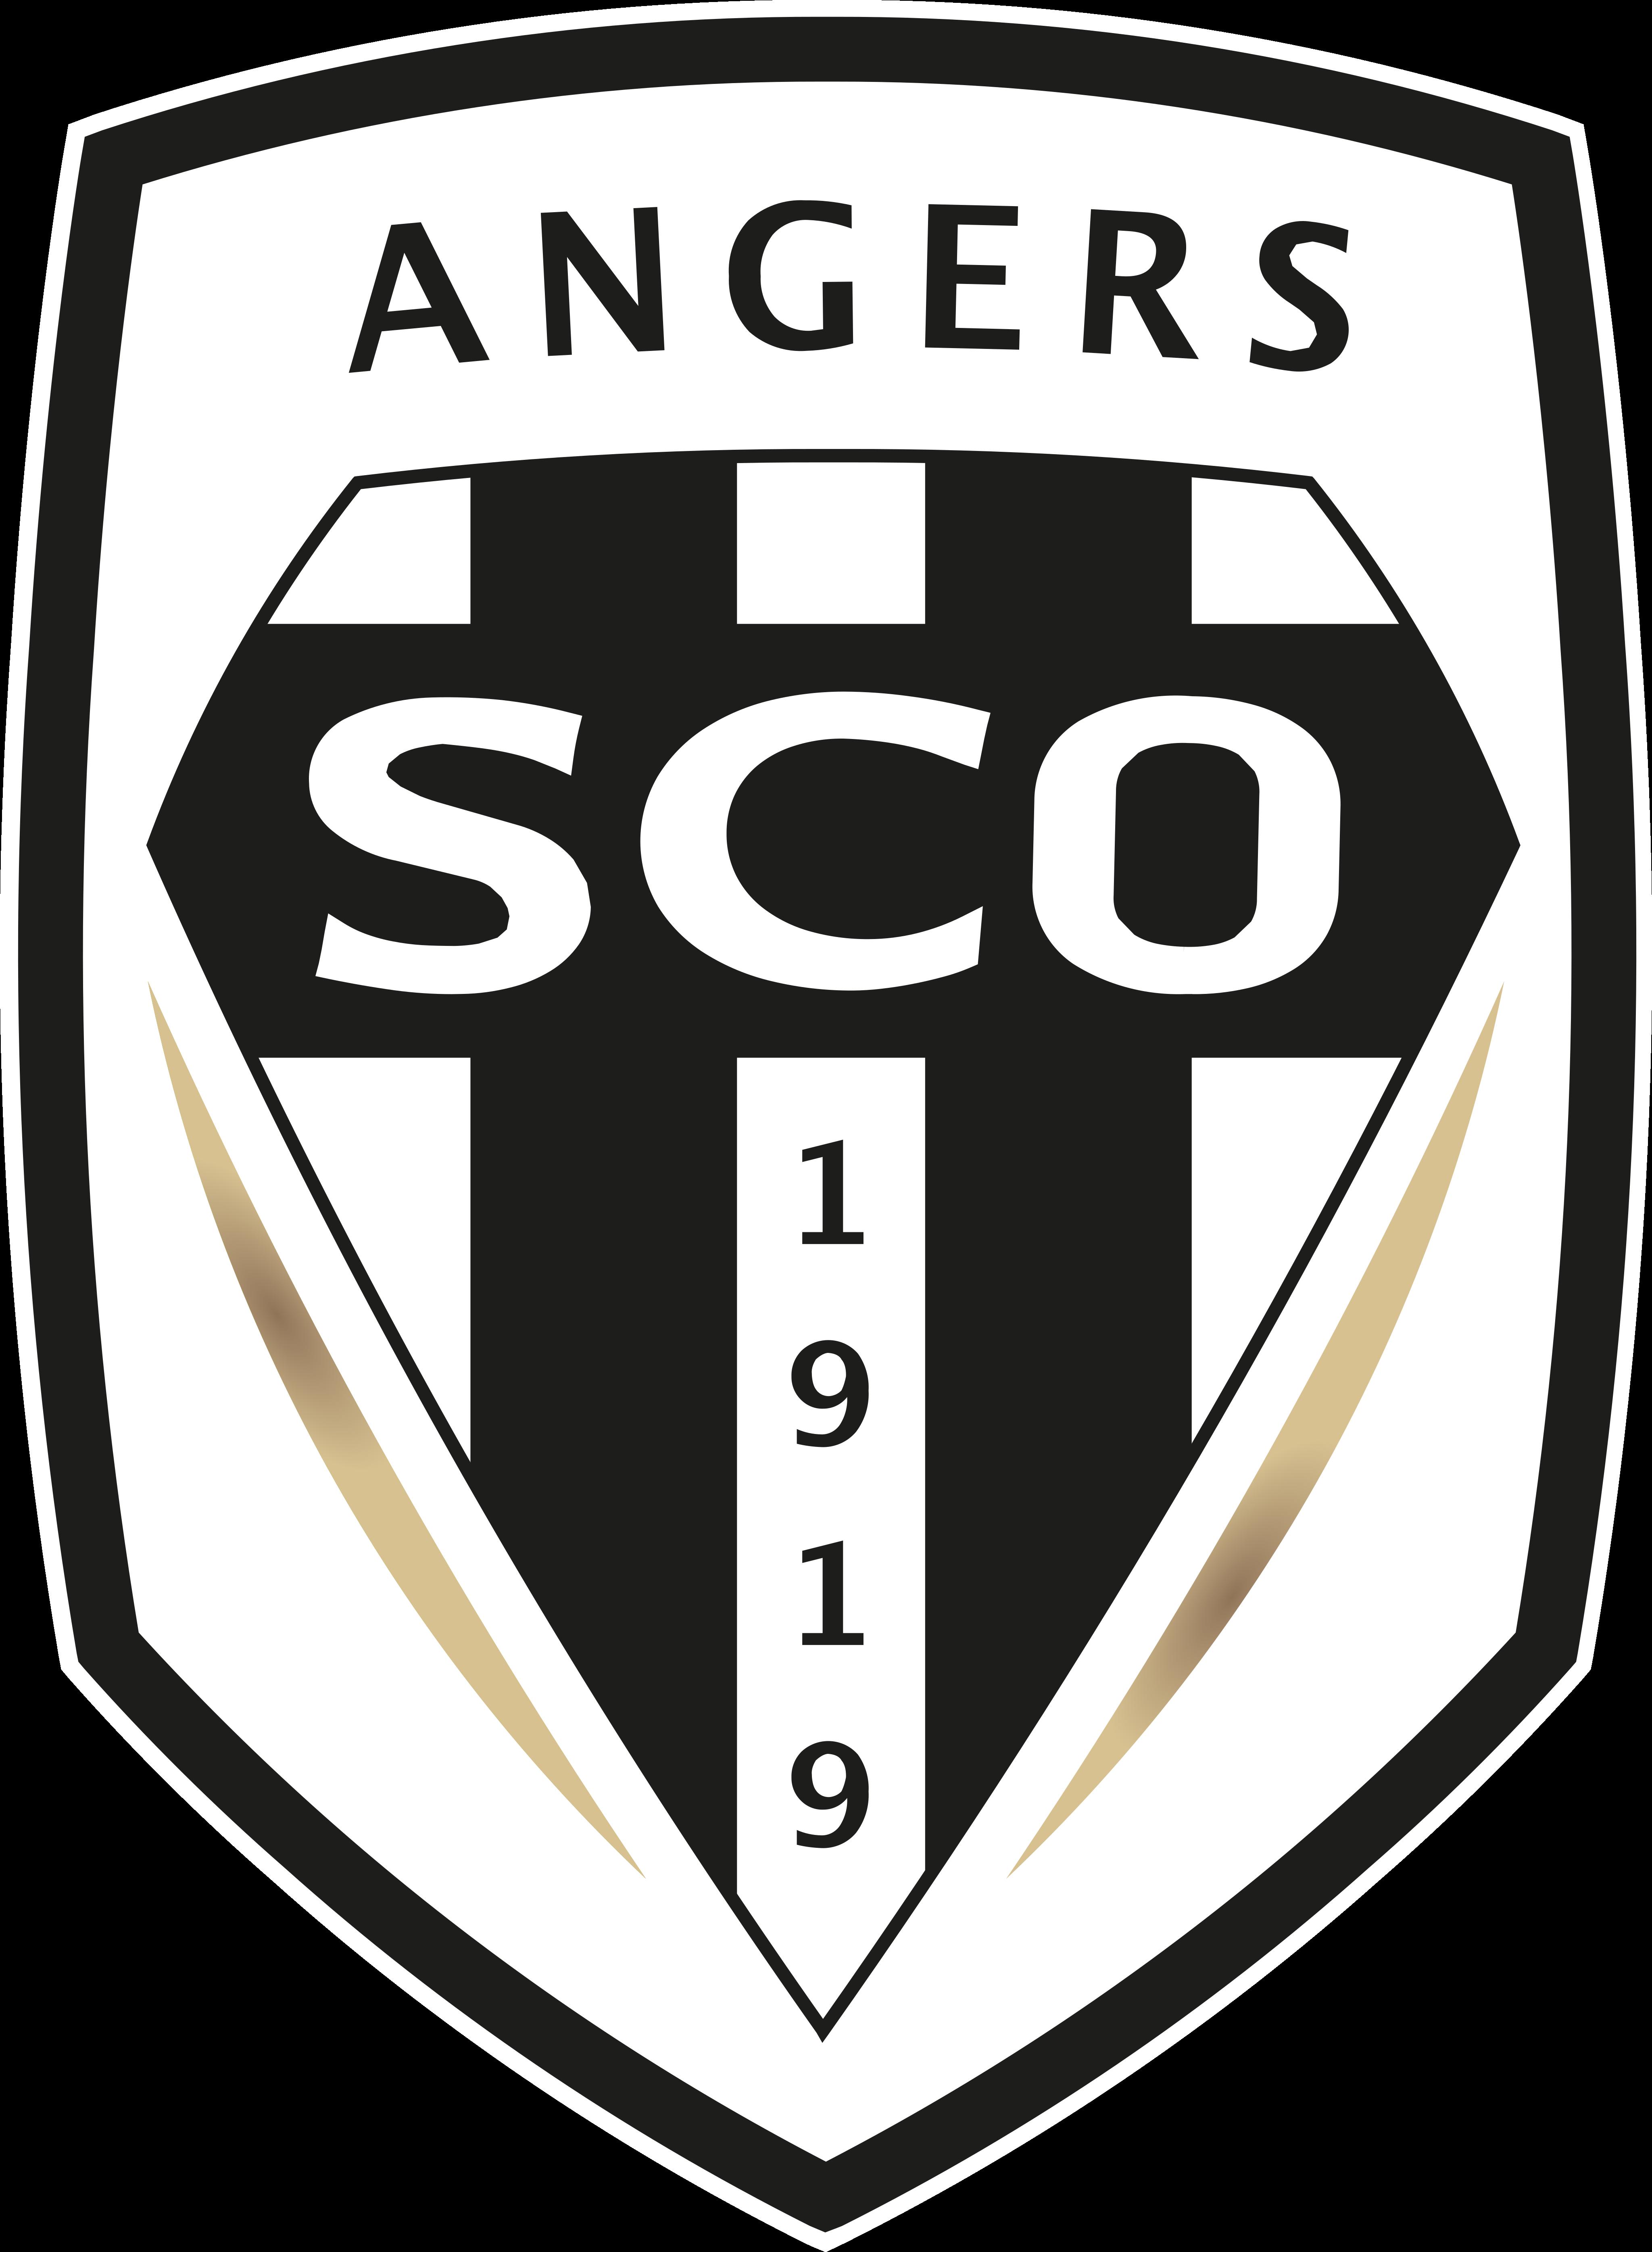 angers sco logo - Angers SCO Logo